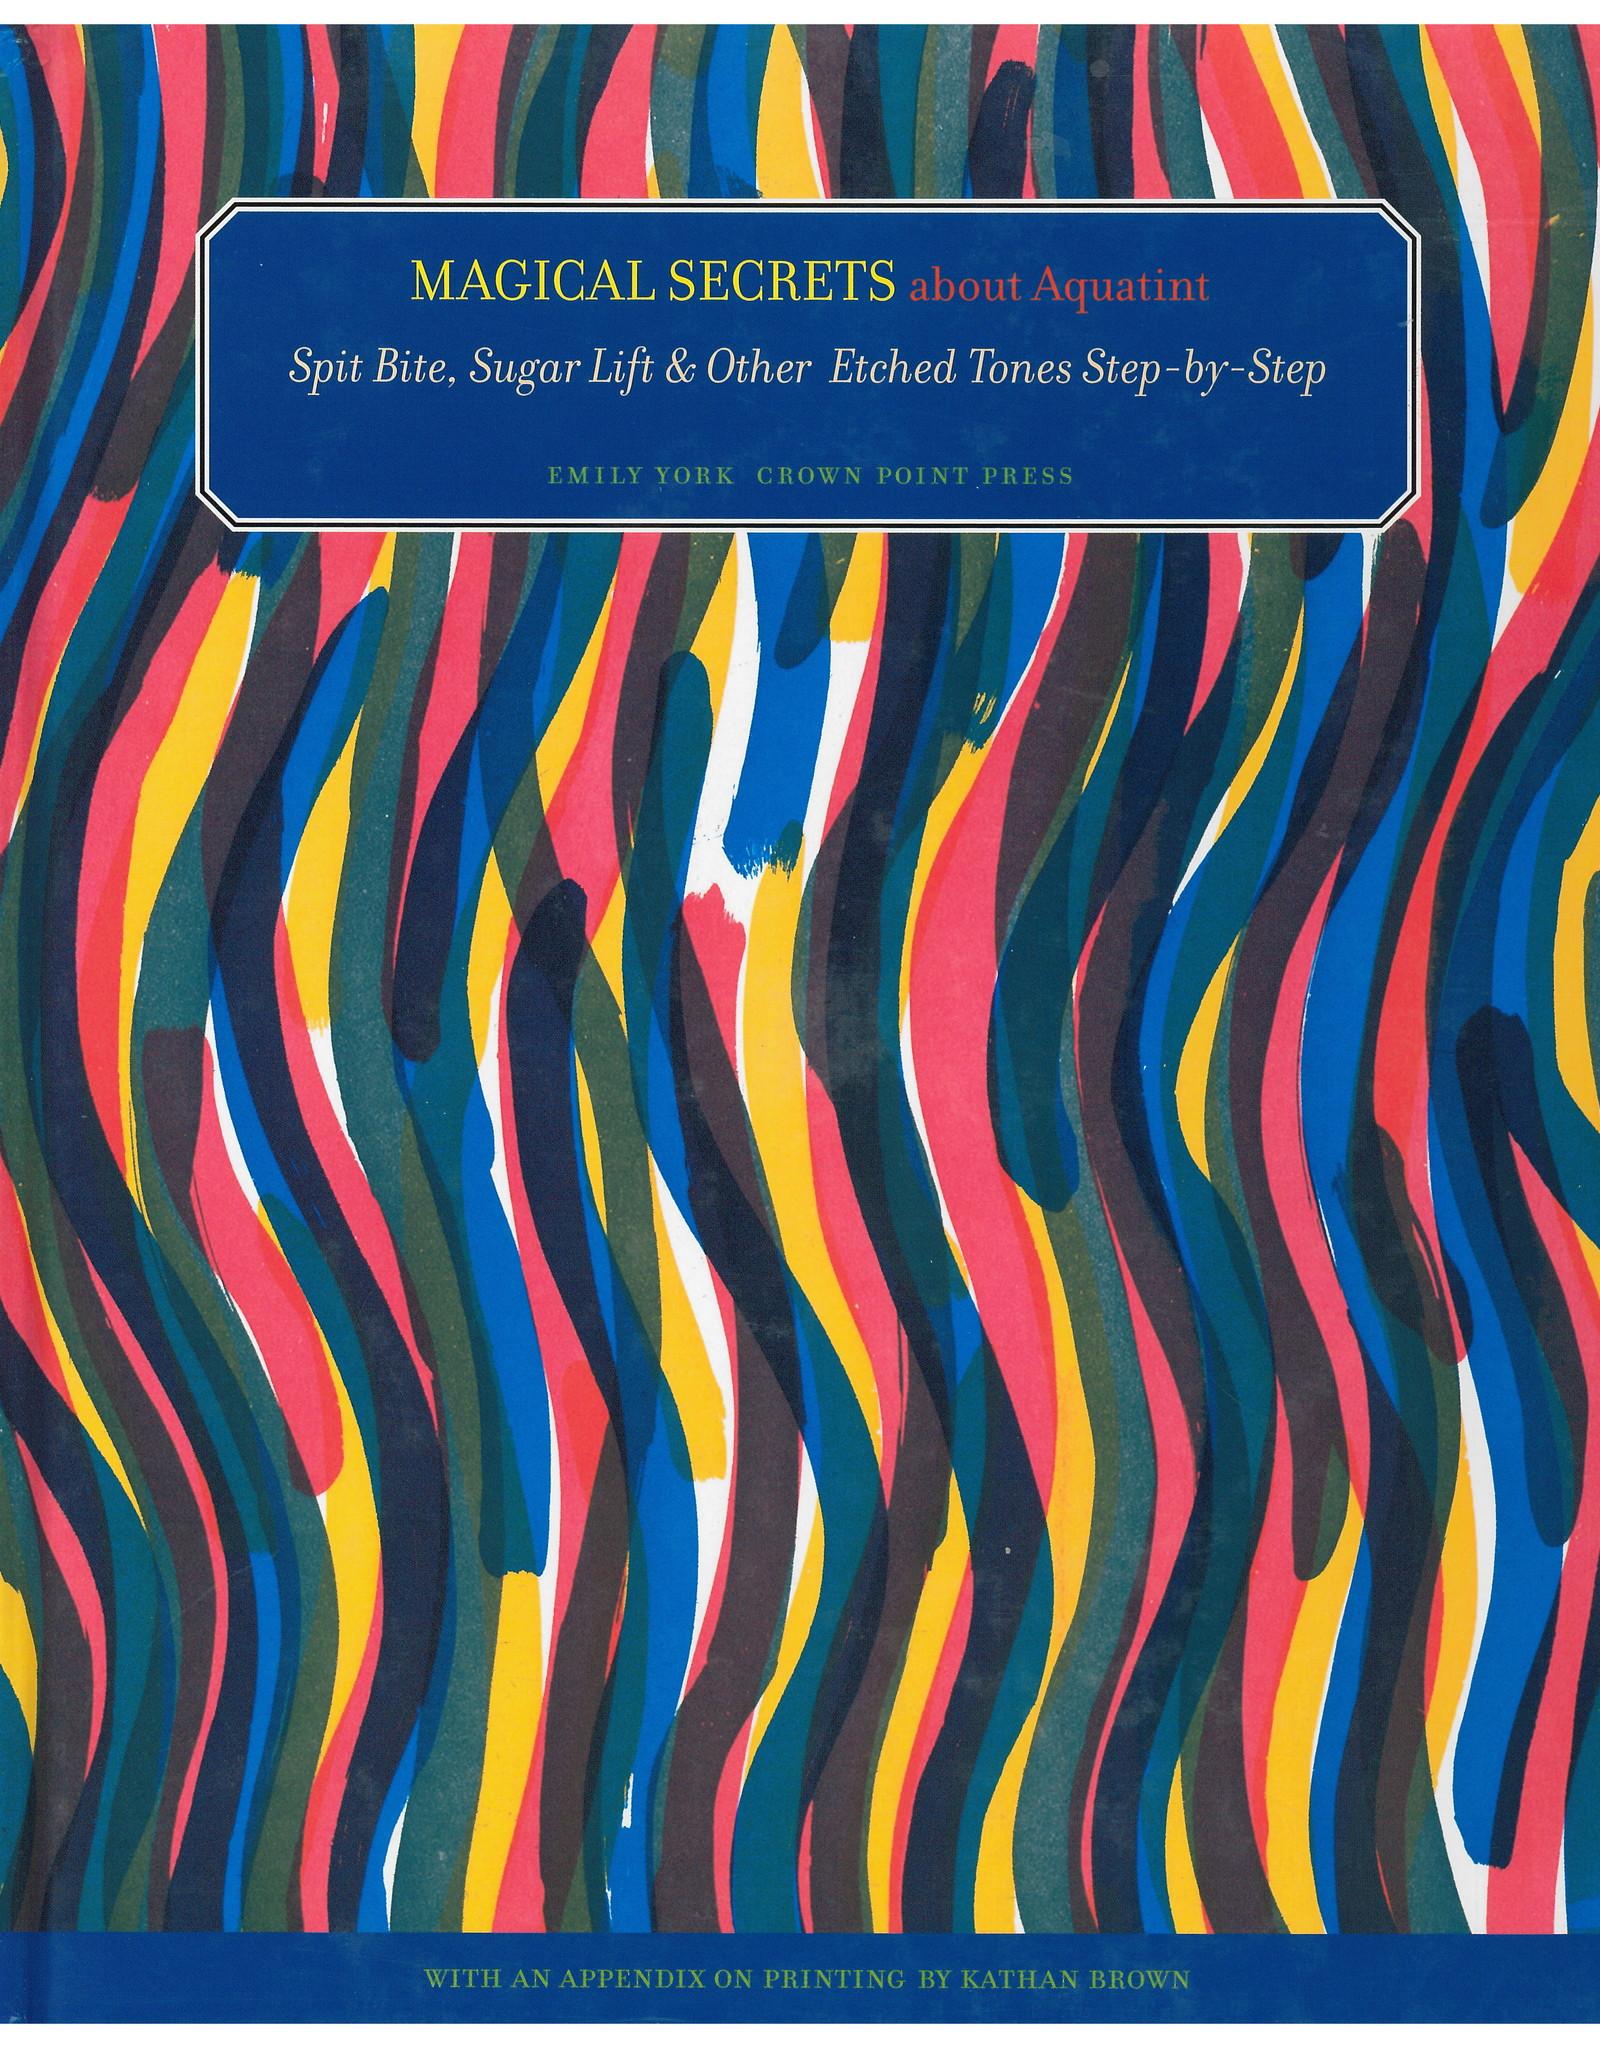 Magical Secrets of Aquatint / Emily York